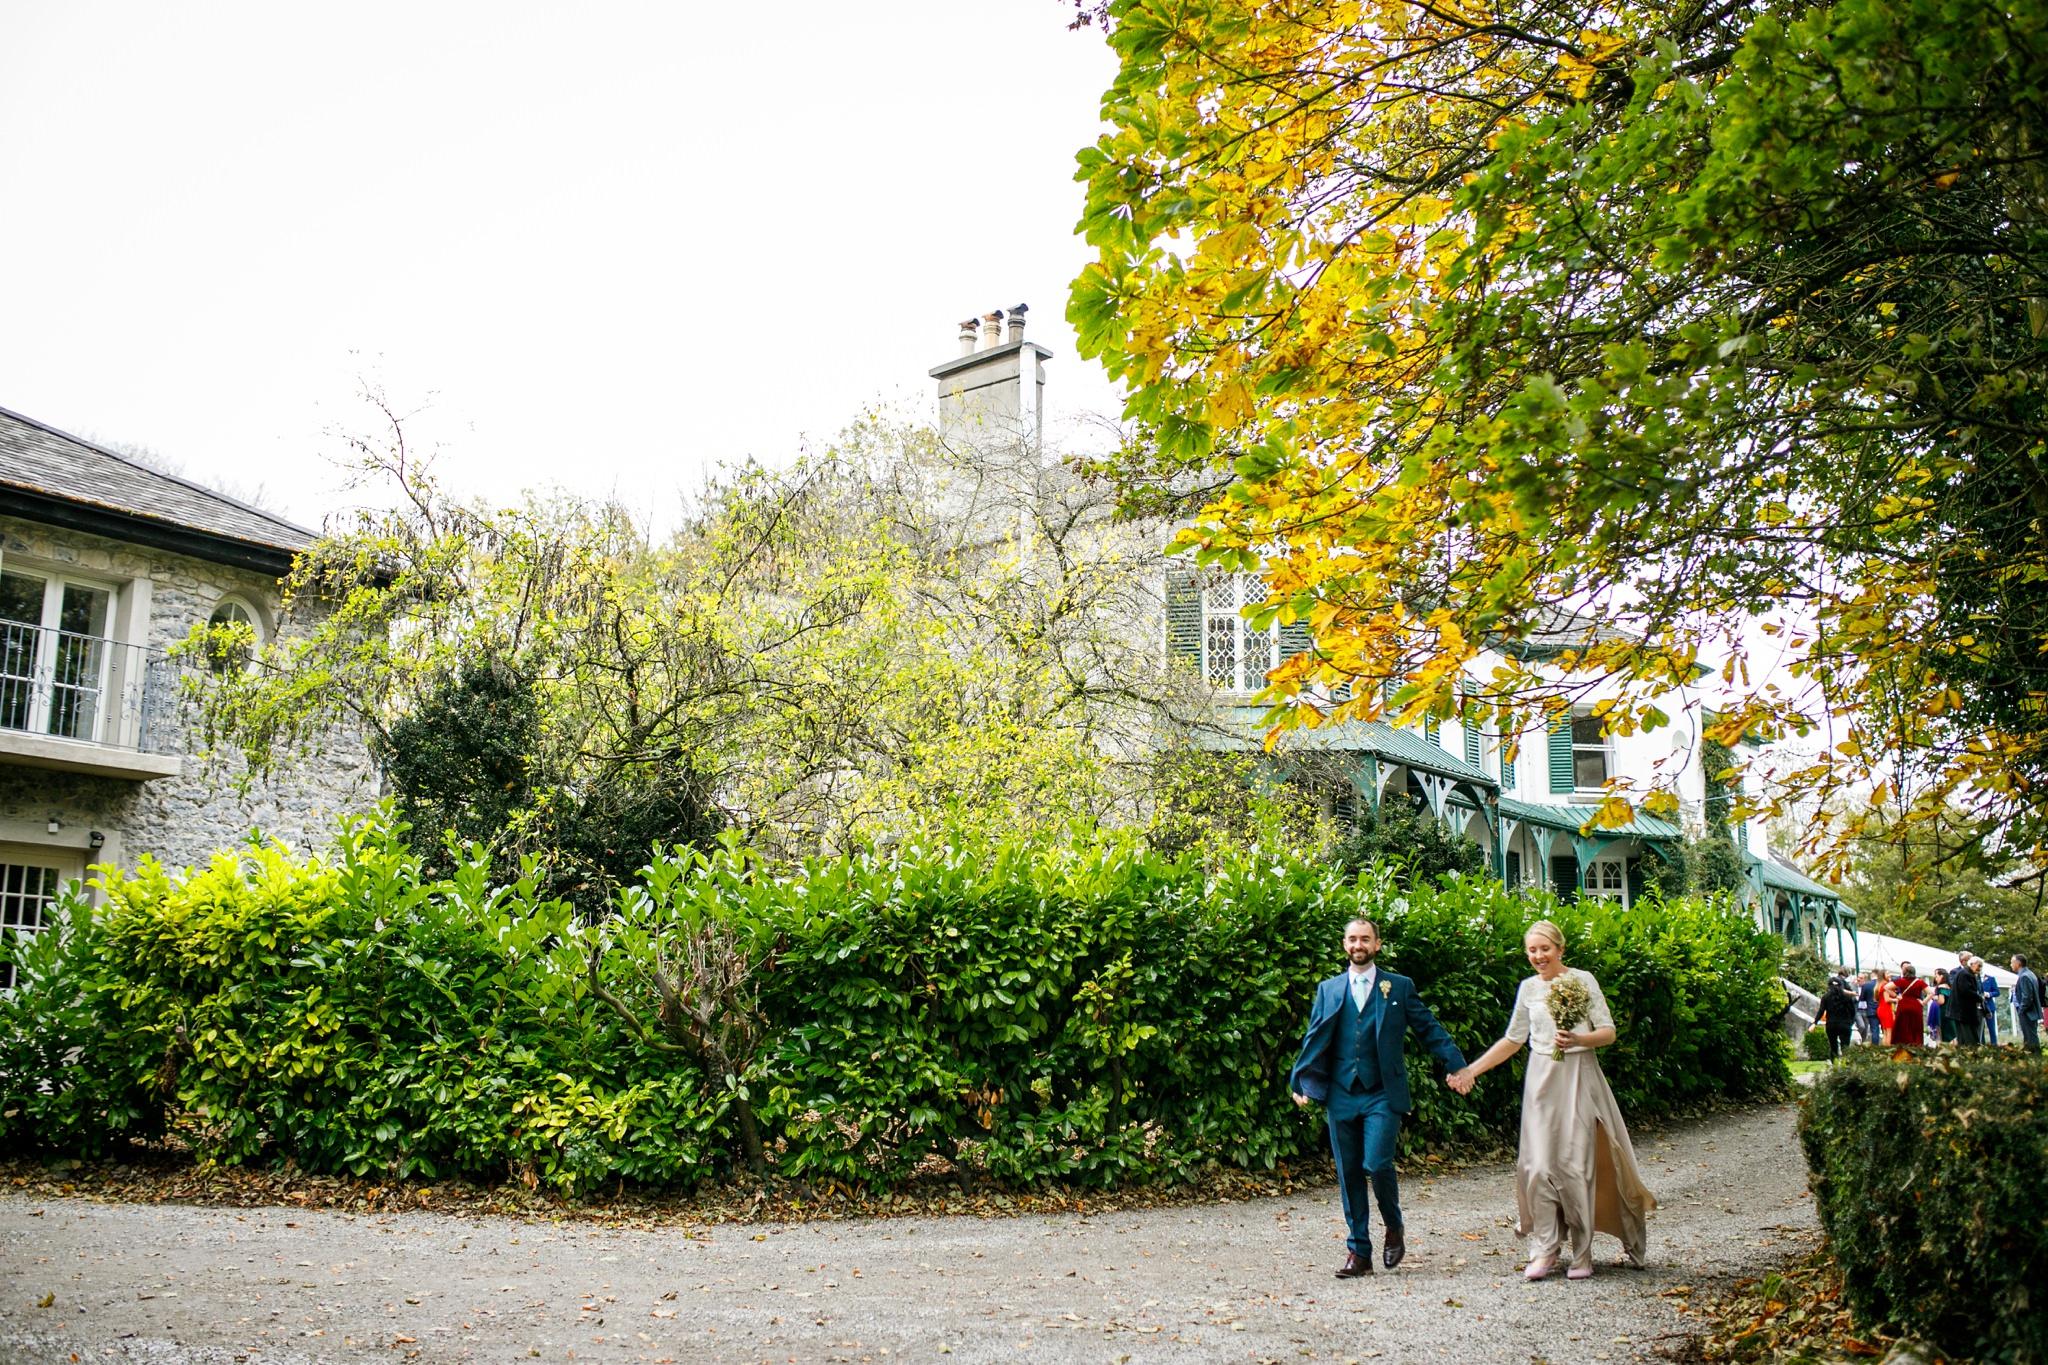 Elisha-Clarke-Photography-Dublin-City-Wedding_0084.jpg